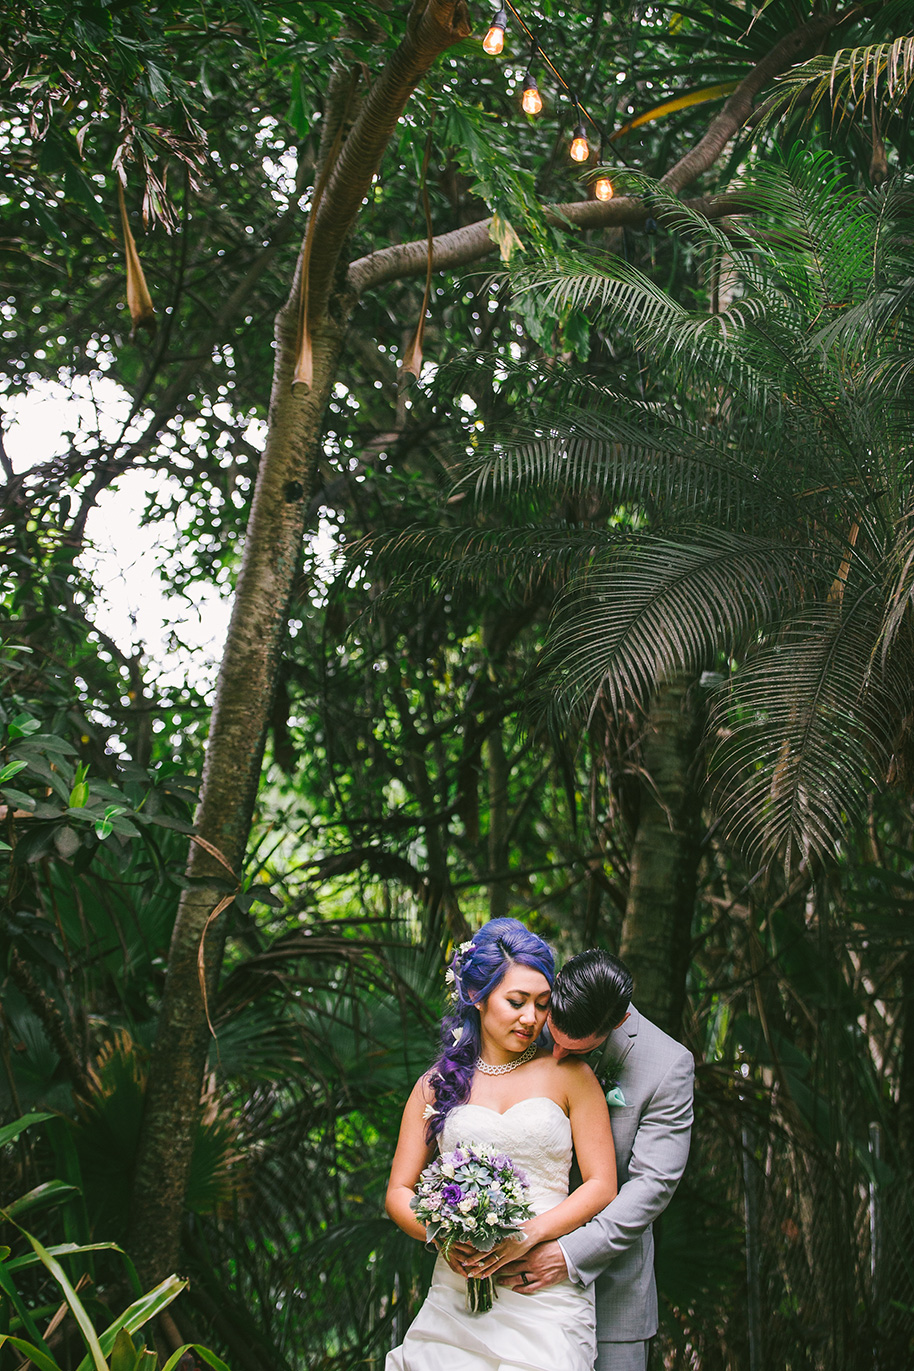 Private-Estate-Wedding-030817-22.jpg